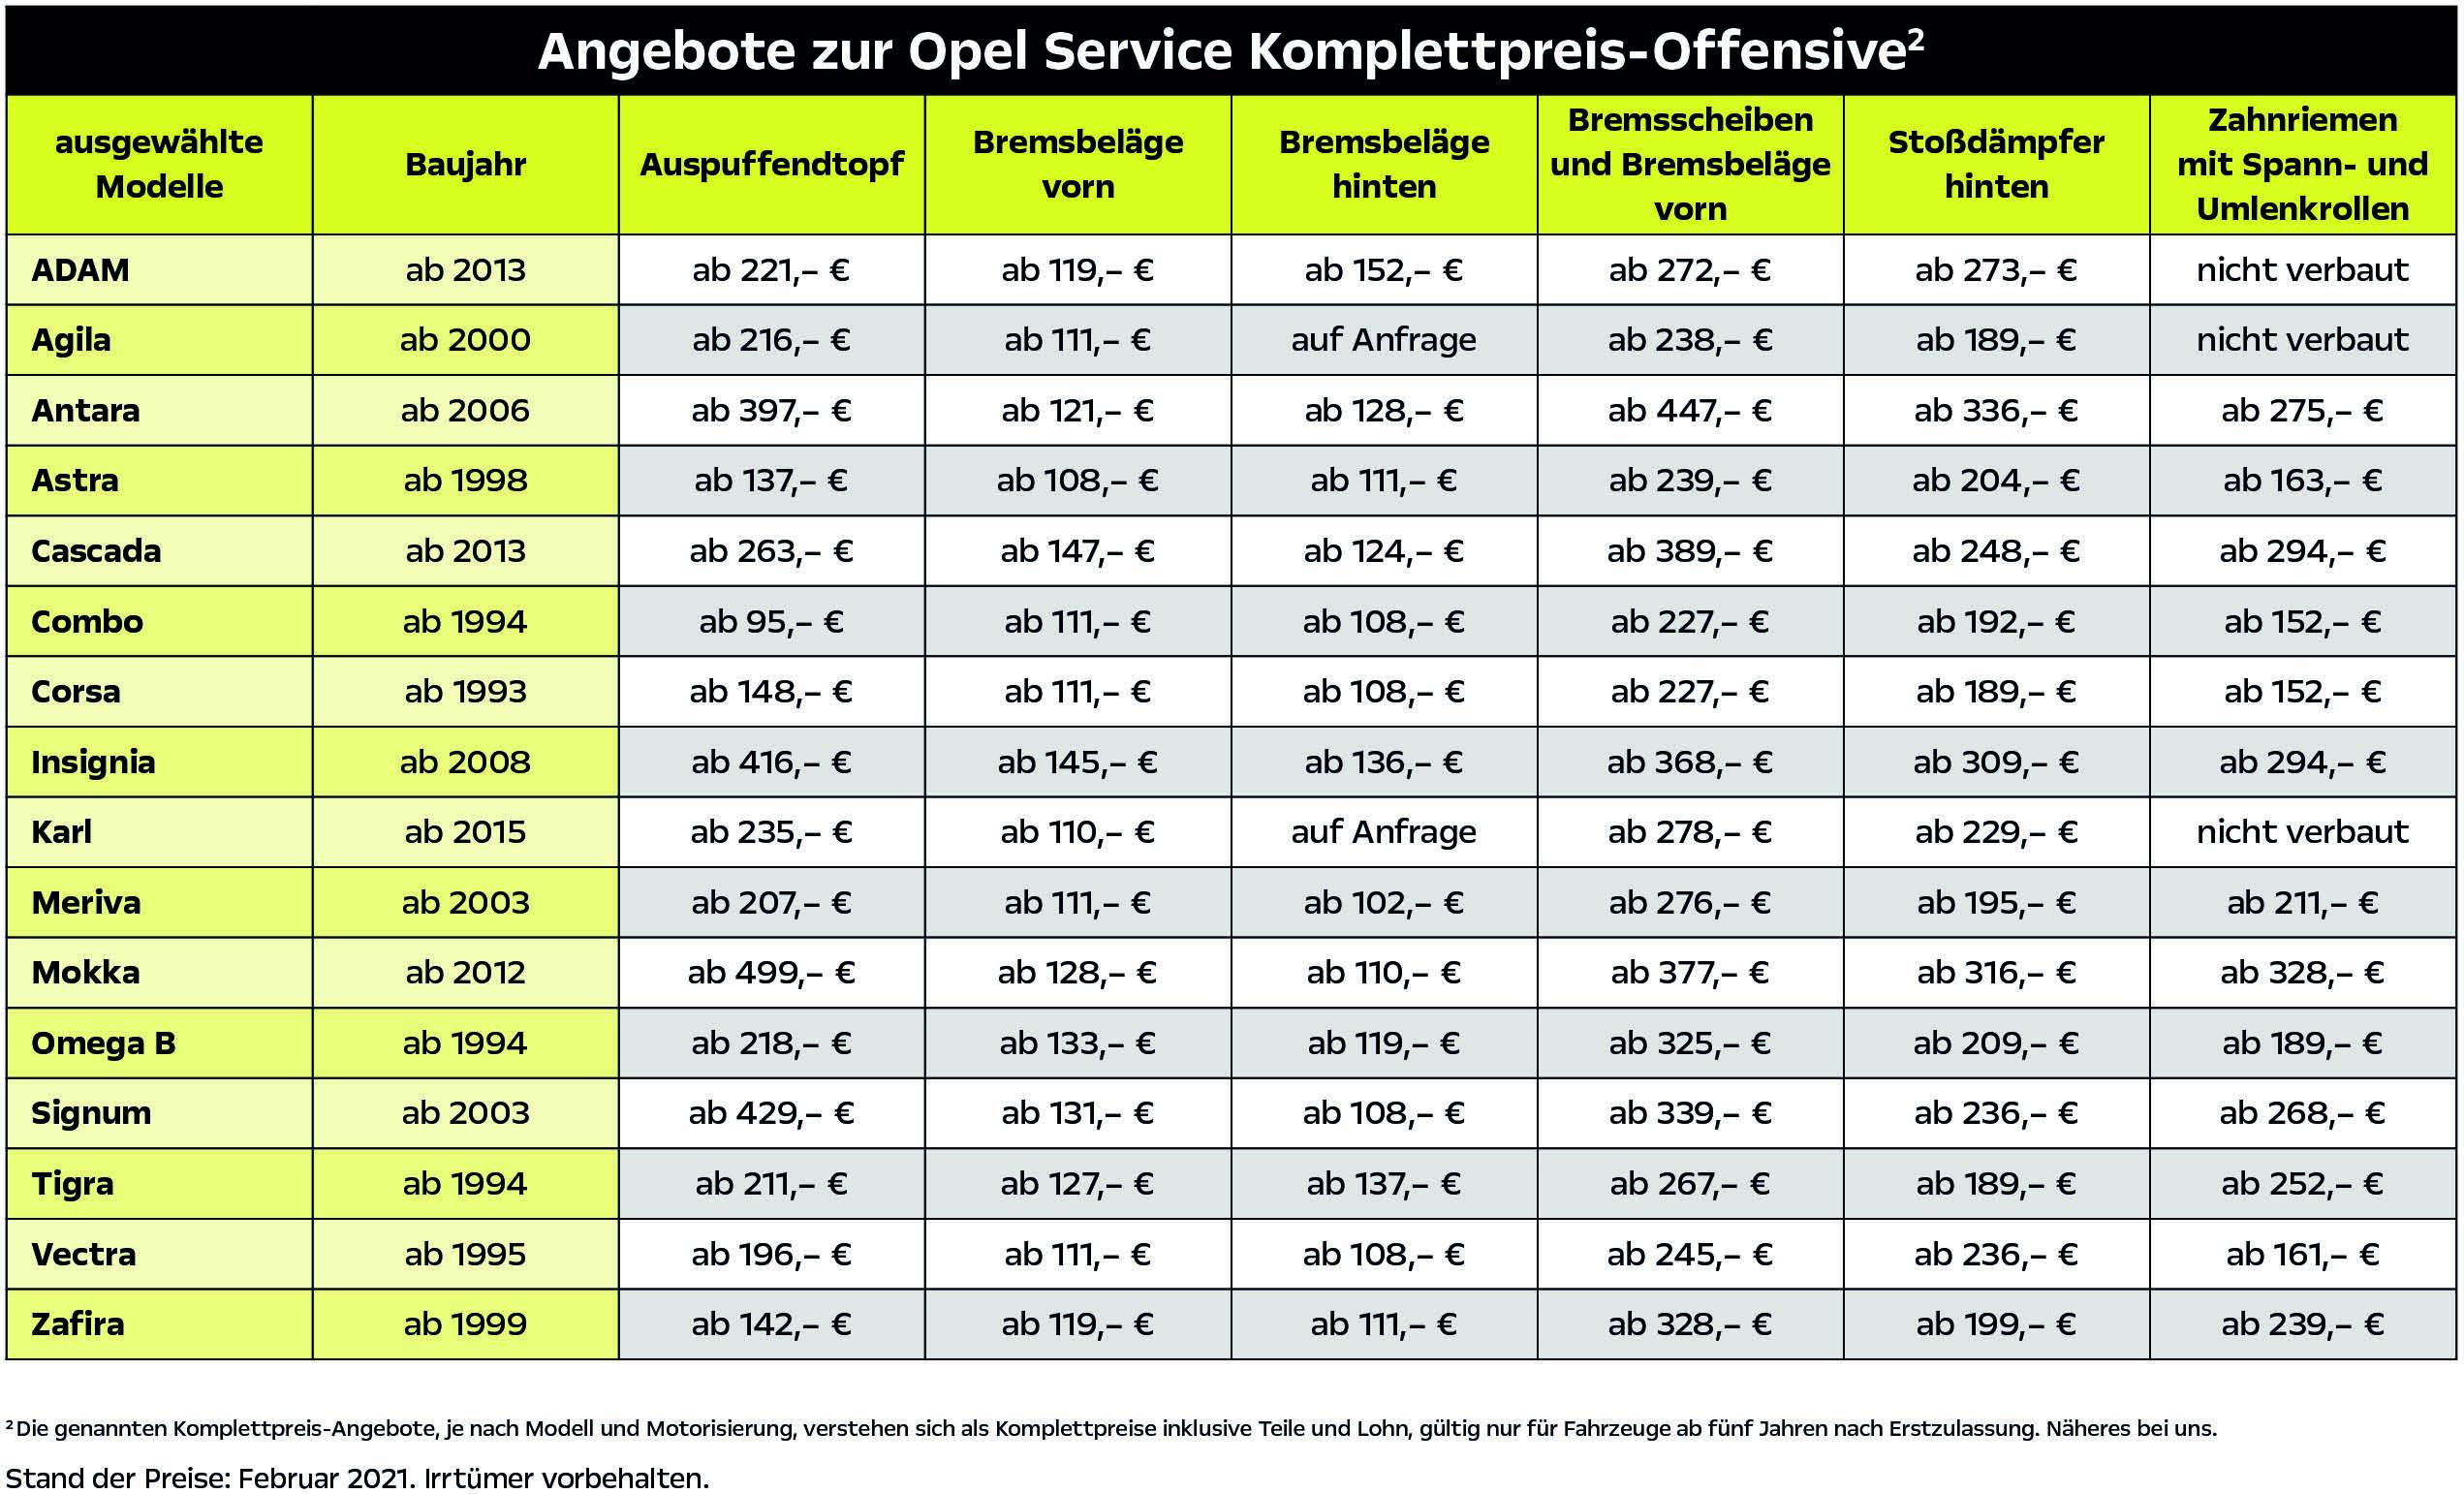 Opel Service Komplettpreis Offensive Tabelle